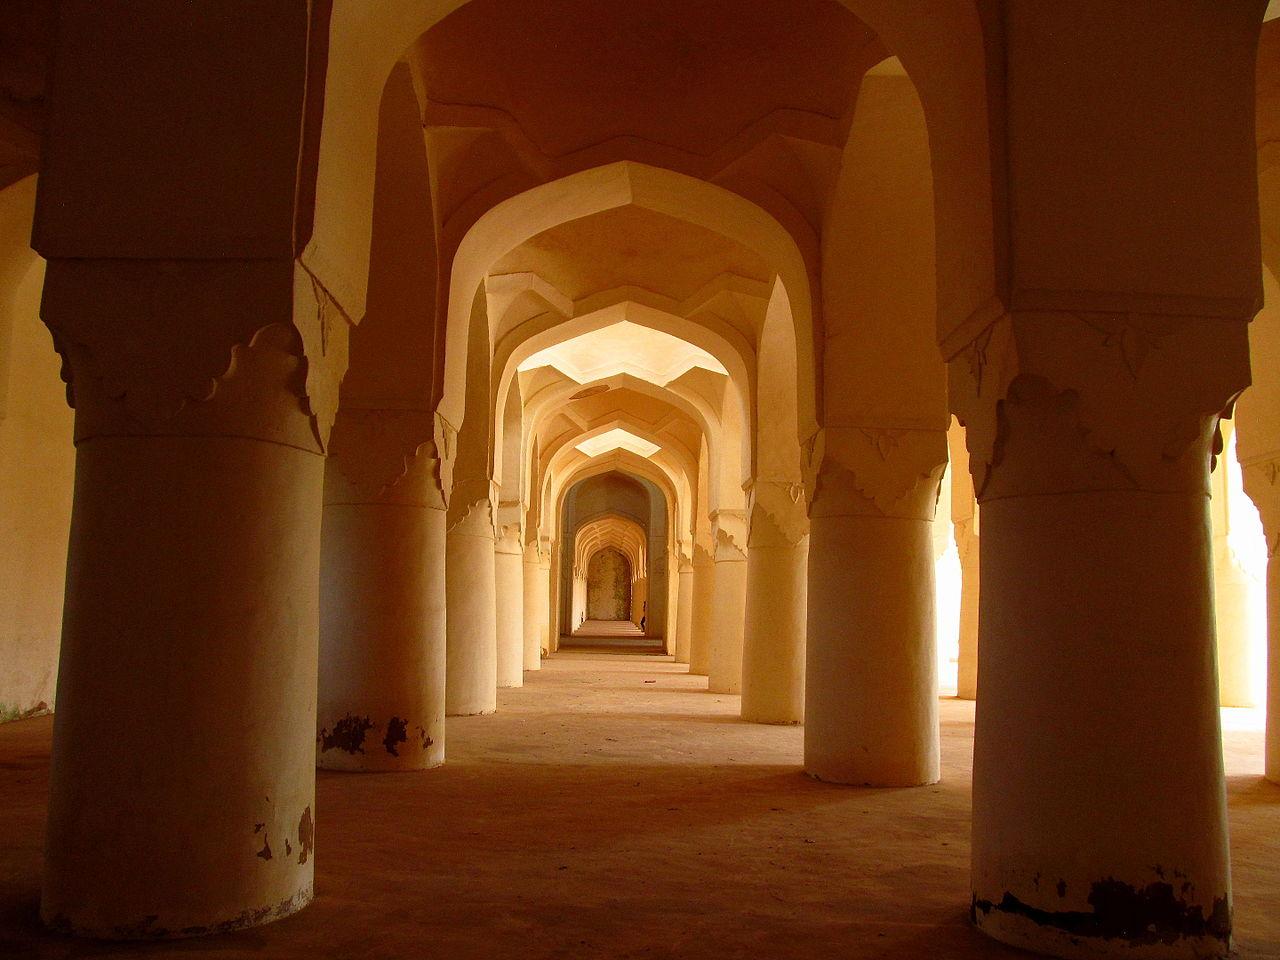 Sola Khamba Mosque - Inside Perspective